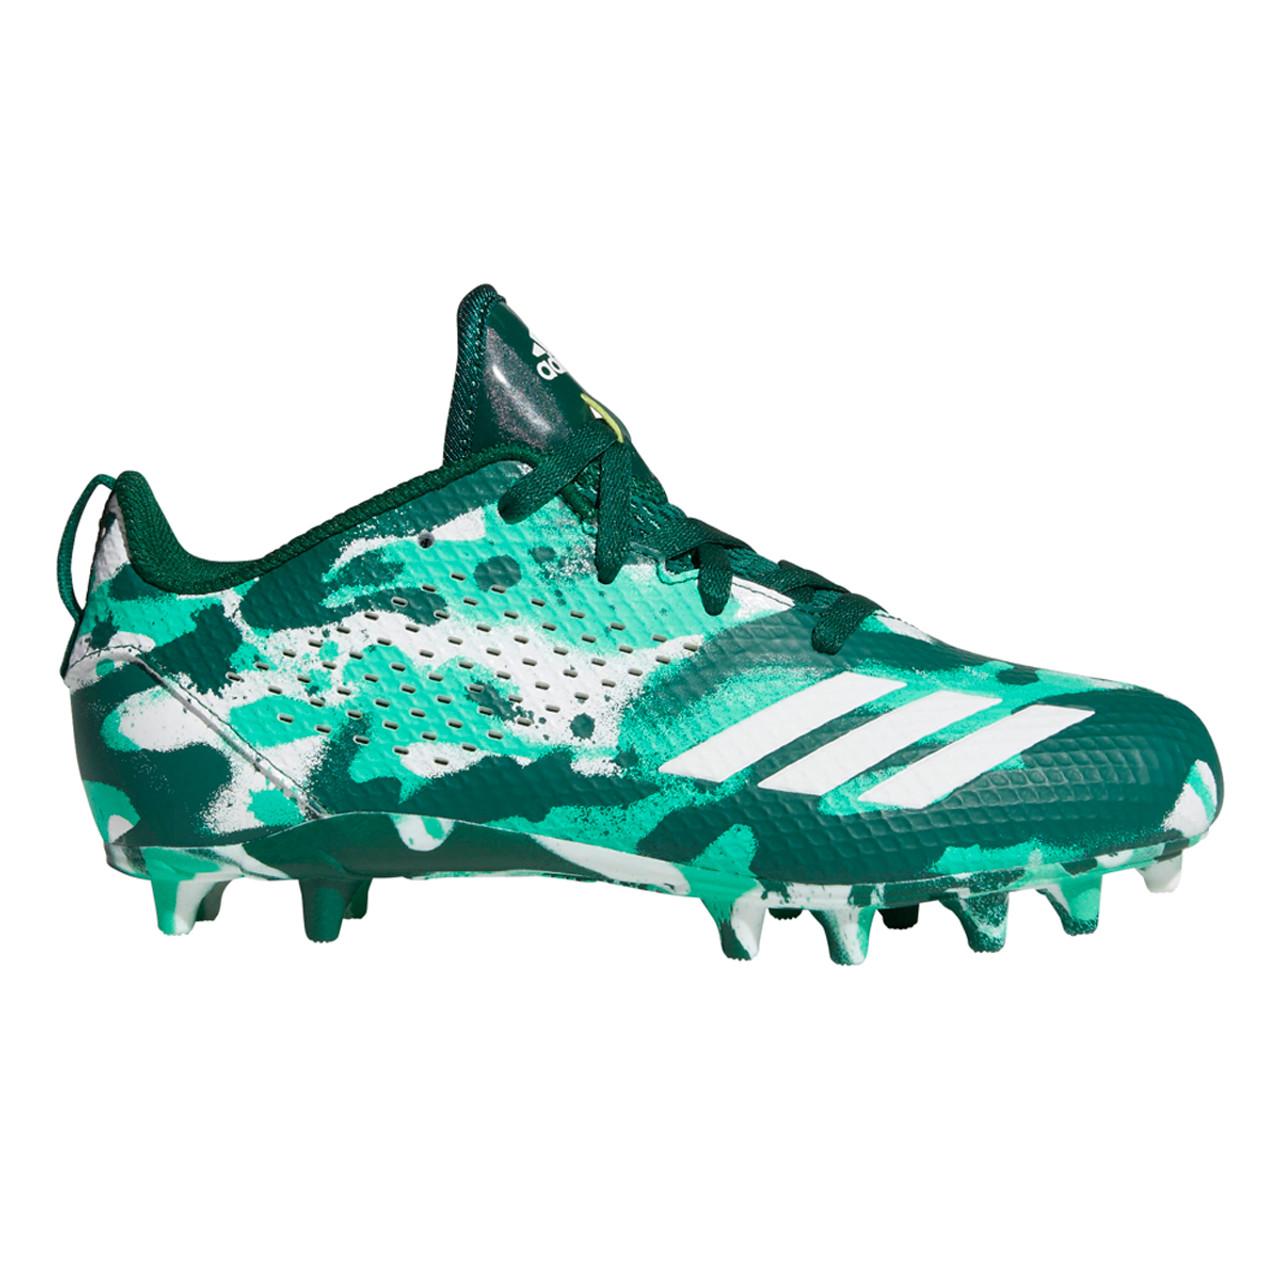 6c1e3ccd0 Adidas Adizero 5 Star 7.0 Cleats   Green \u0026 White Football Cleats;